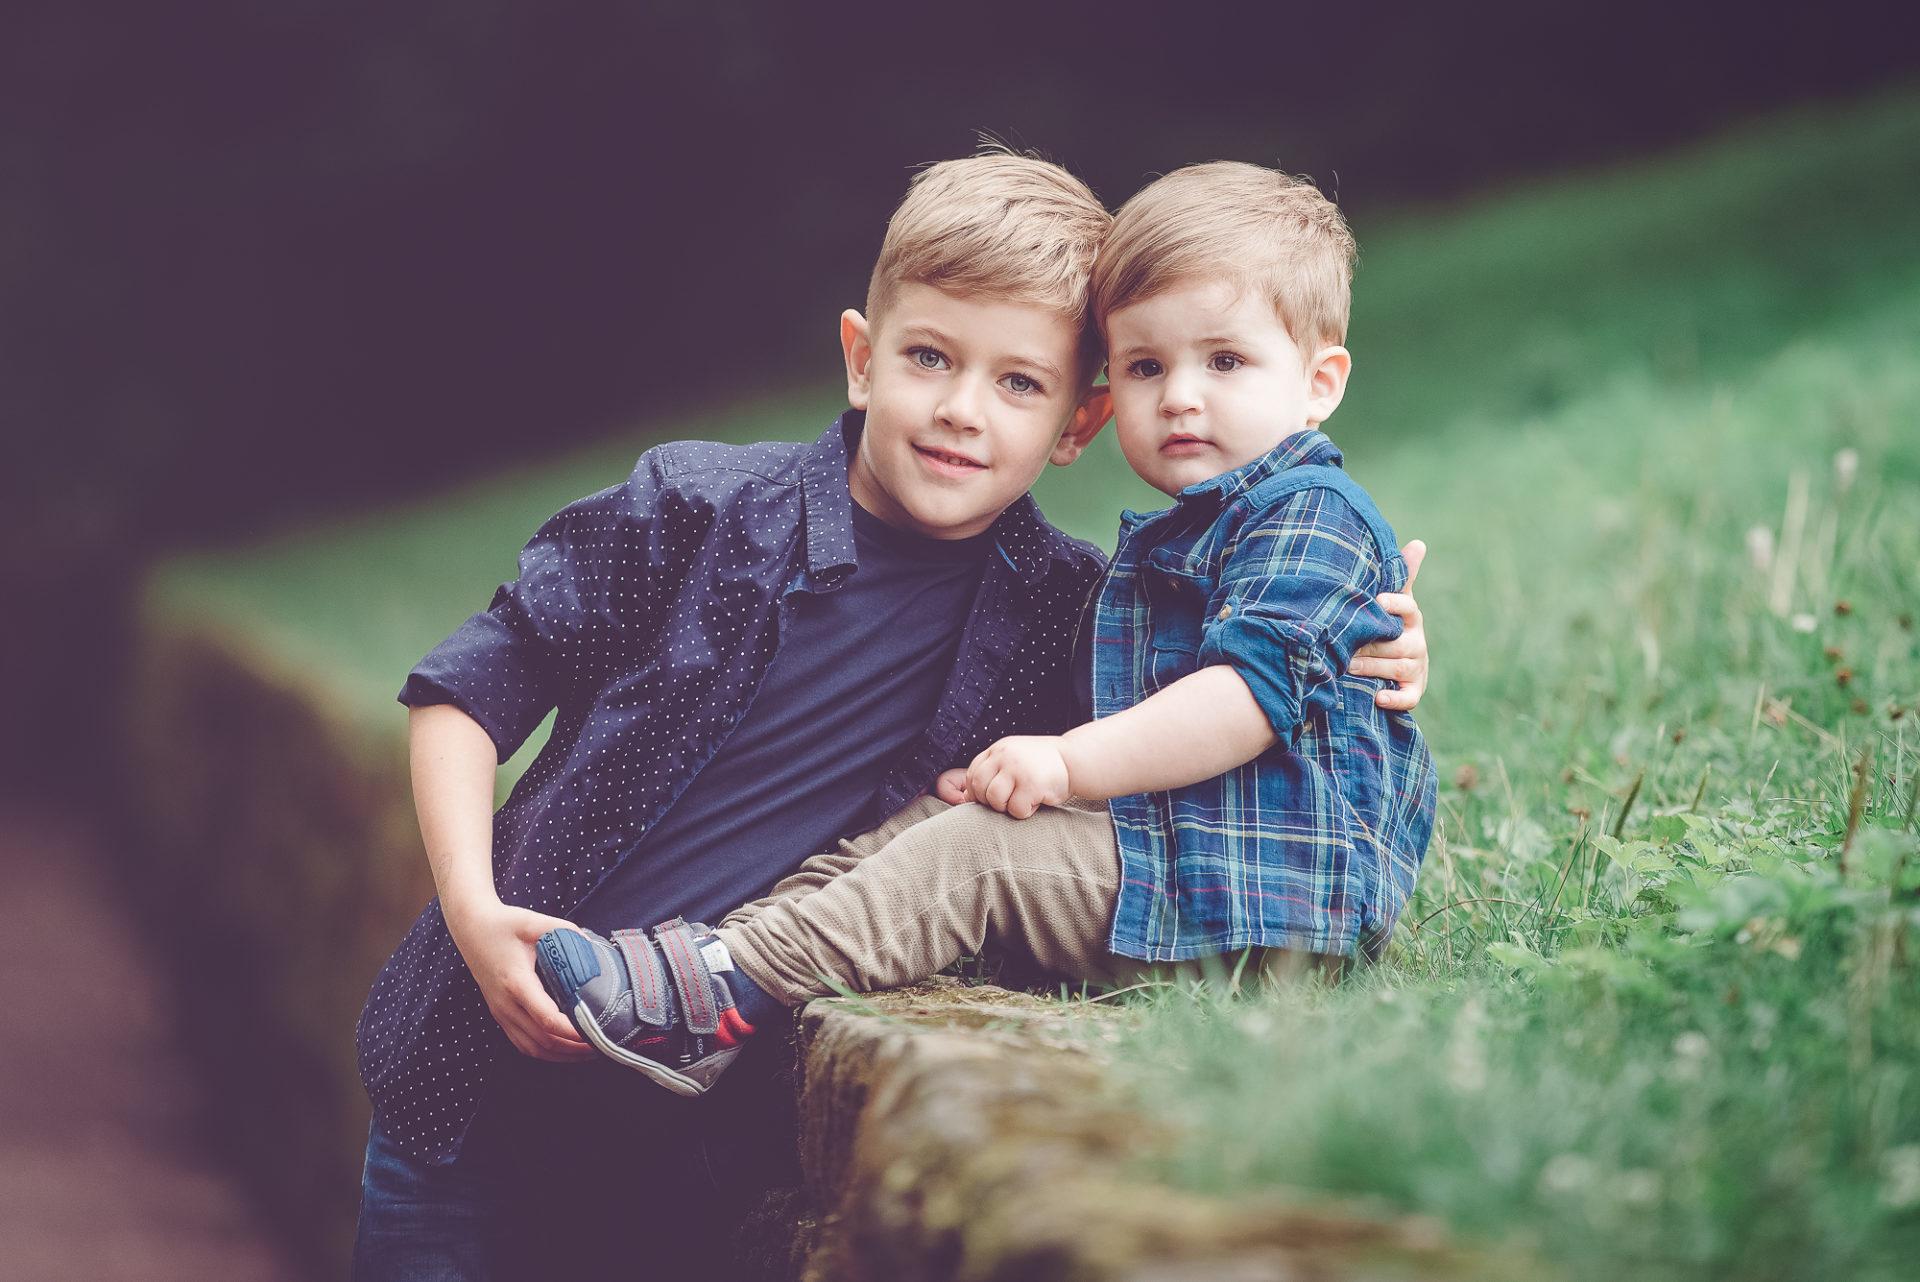 Erfurt Thüringen Tessa Trommer Fotografie Baby Geschwister Familienfotos Outdoor Geschwister Brüder